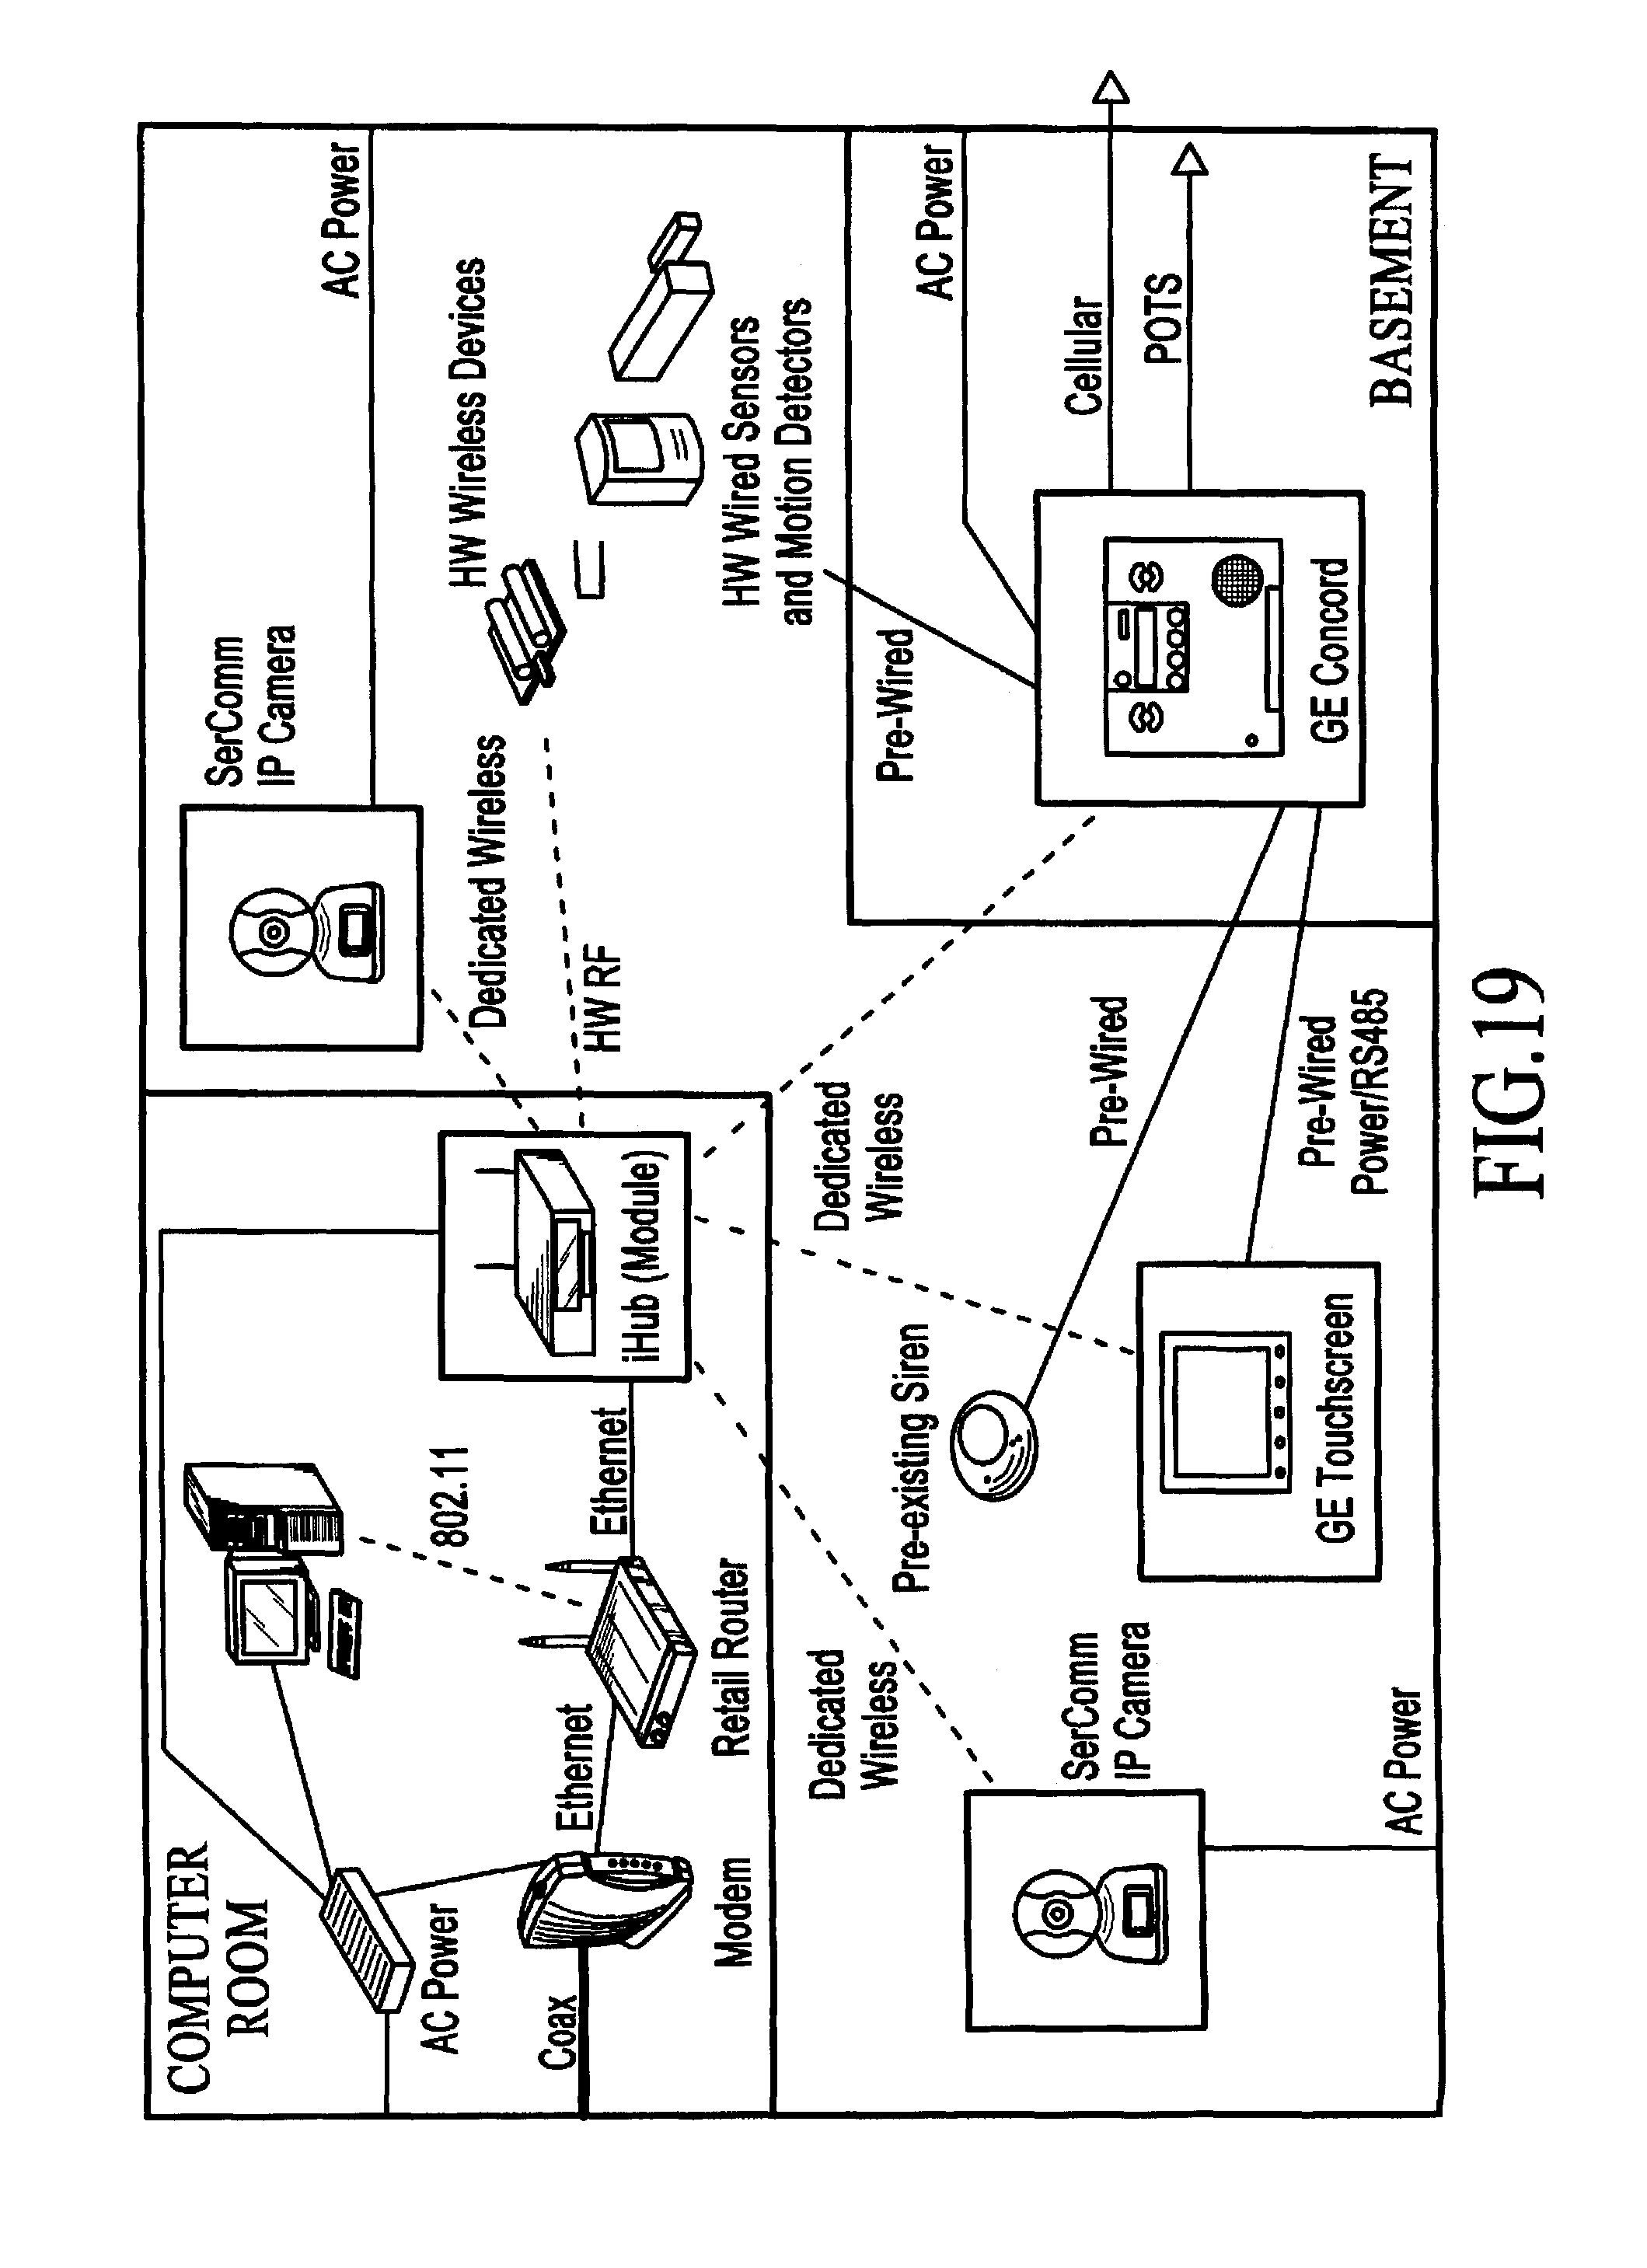 Patent US 10,127,801 B2